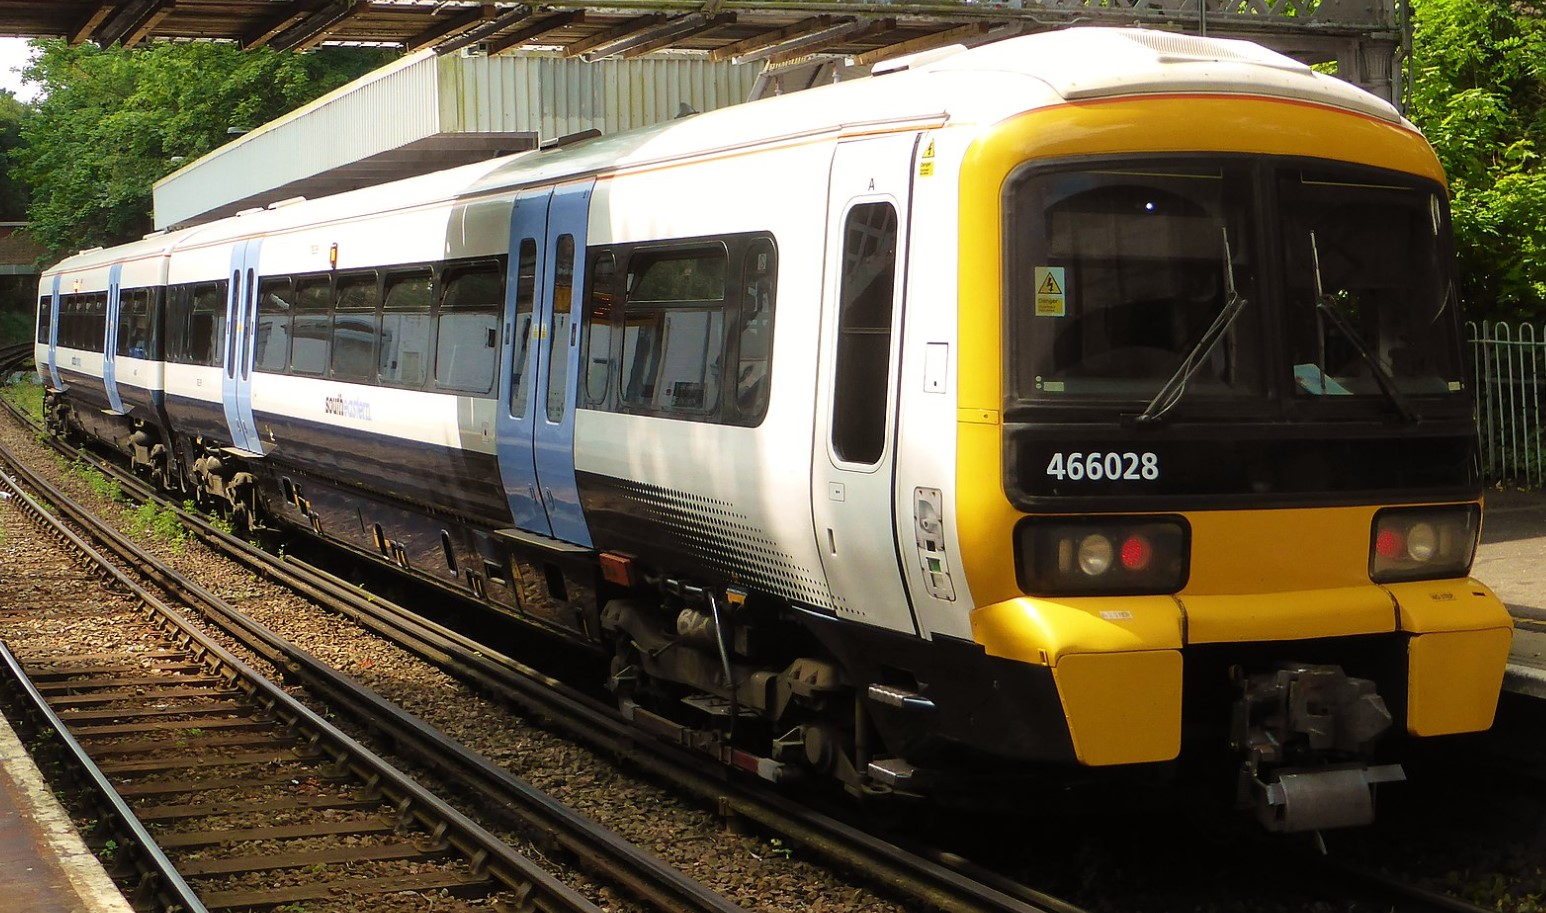 466028 at Sundridge Park in July 2015. ©Train Photos